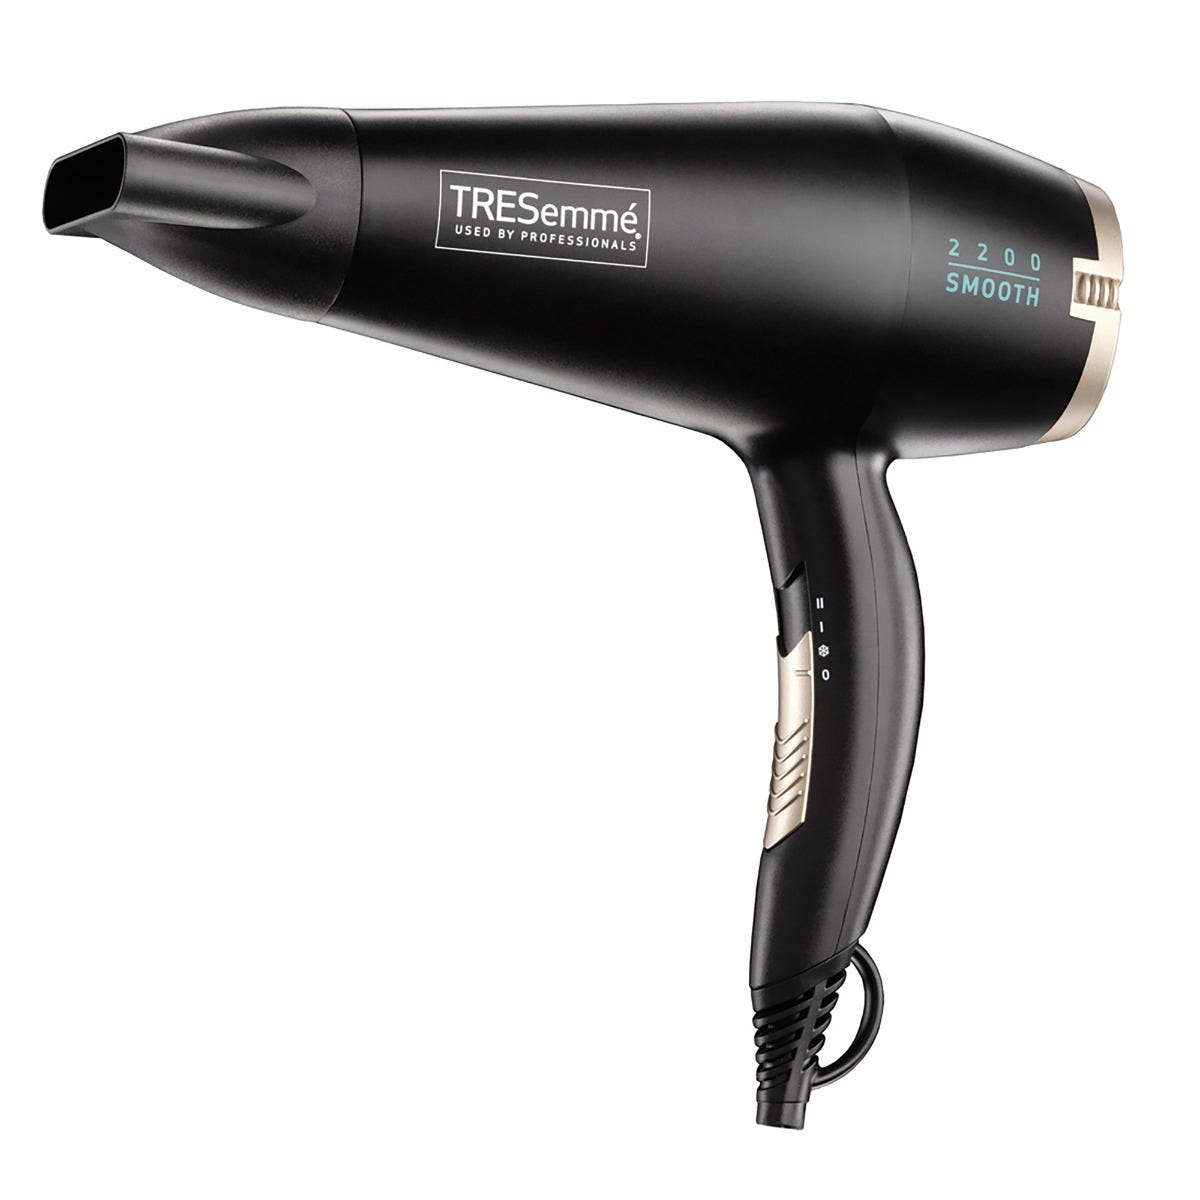 Tresemme TR5540 2200W Dc Salon Professional Power Hairdryer - Black